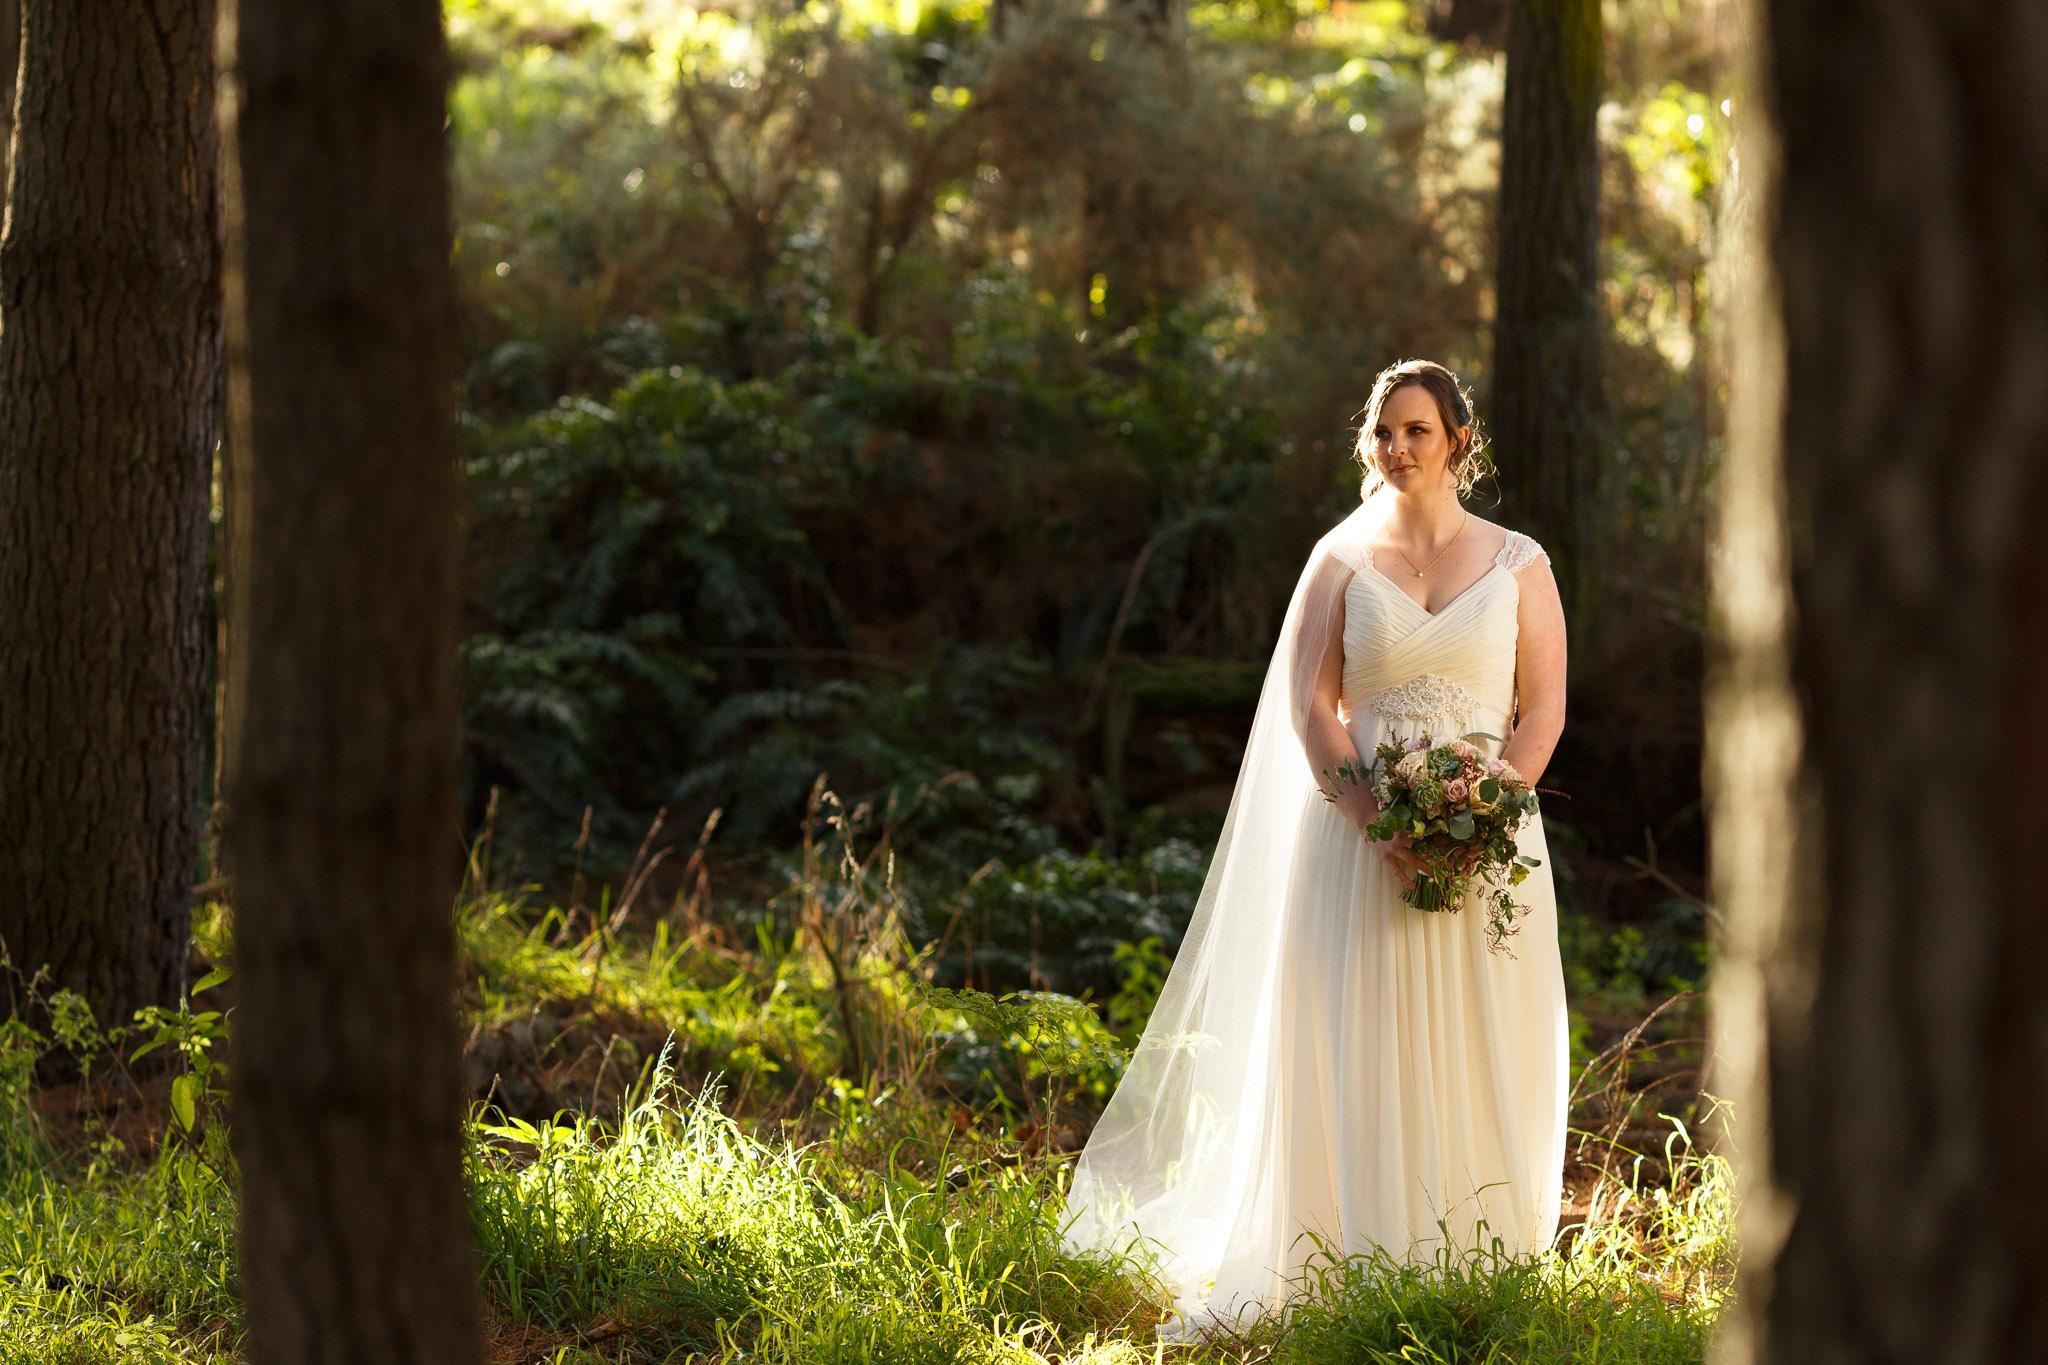 highlight_wedding_photography_manawatu_palmerston_north_new_zealand_rangitikei_golf_ohakea-56.jpg